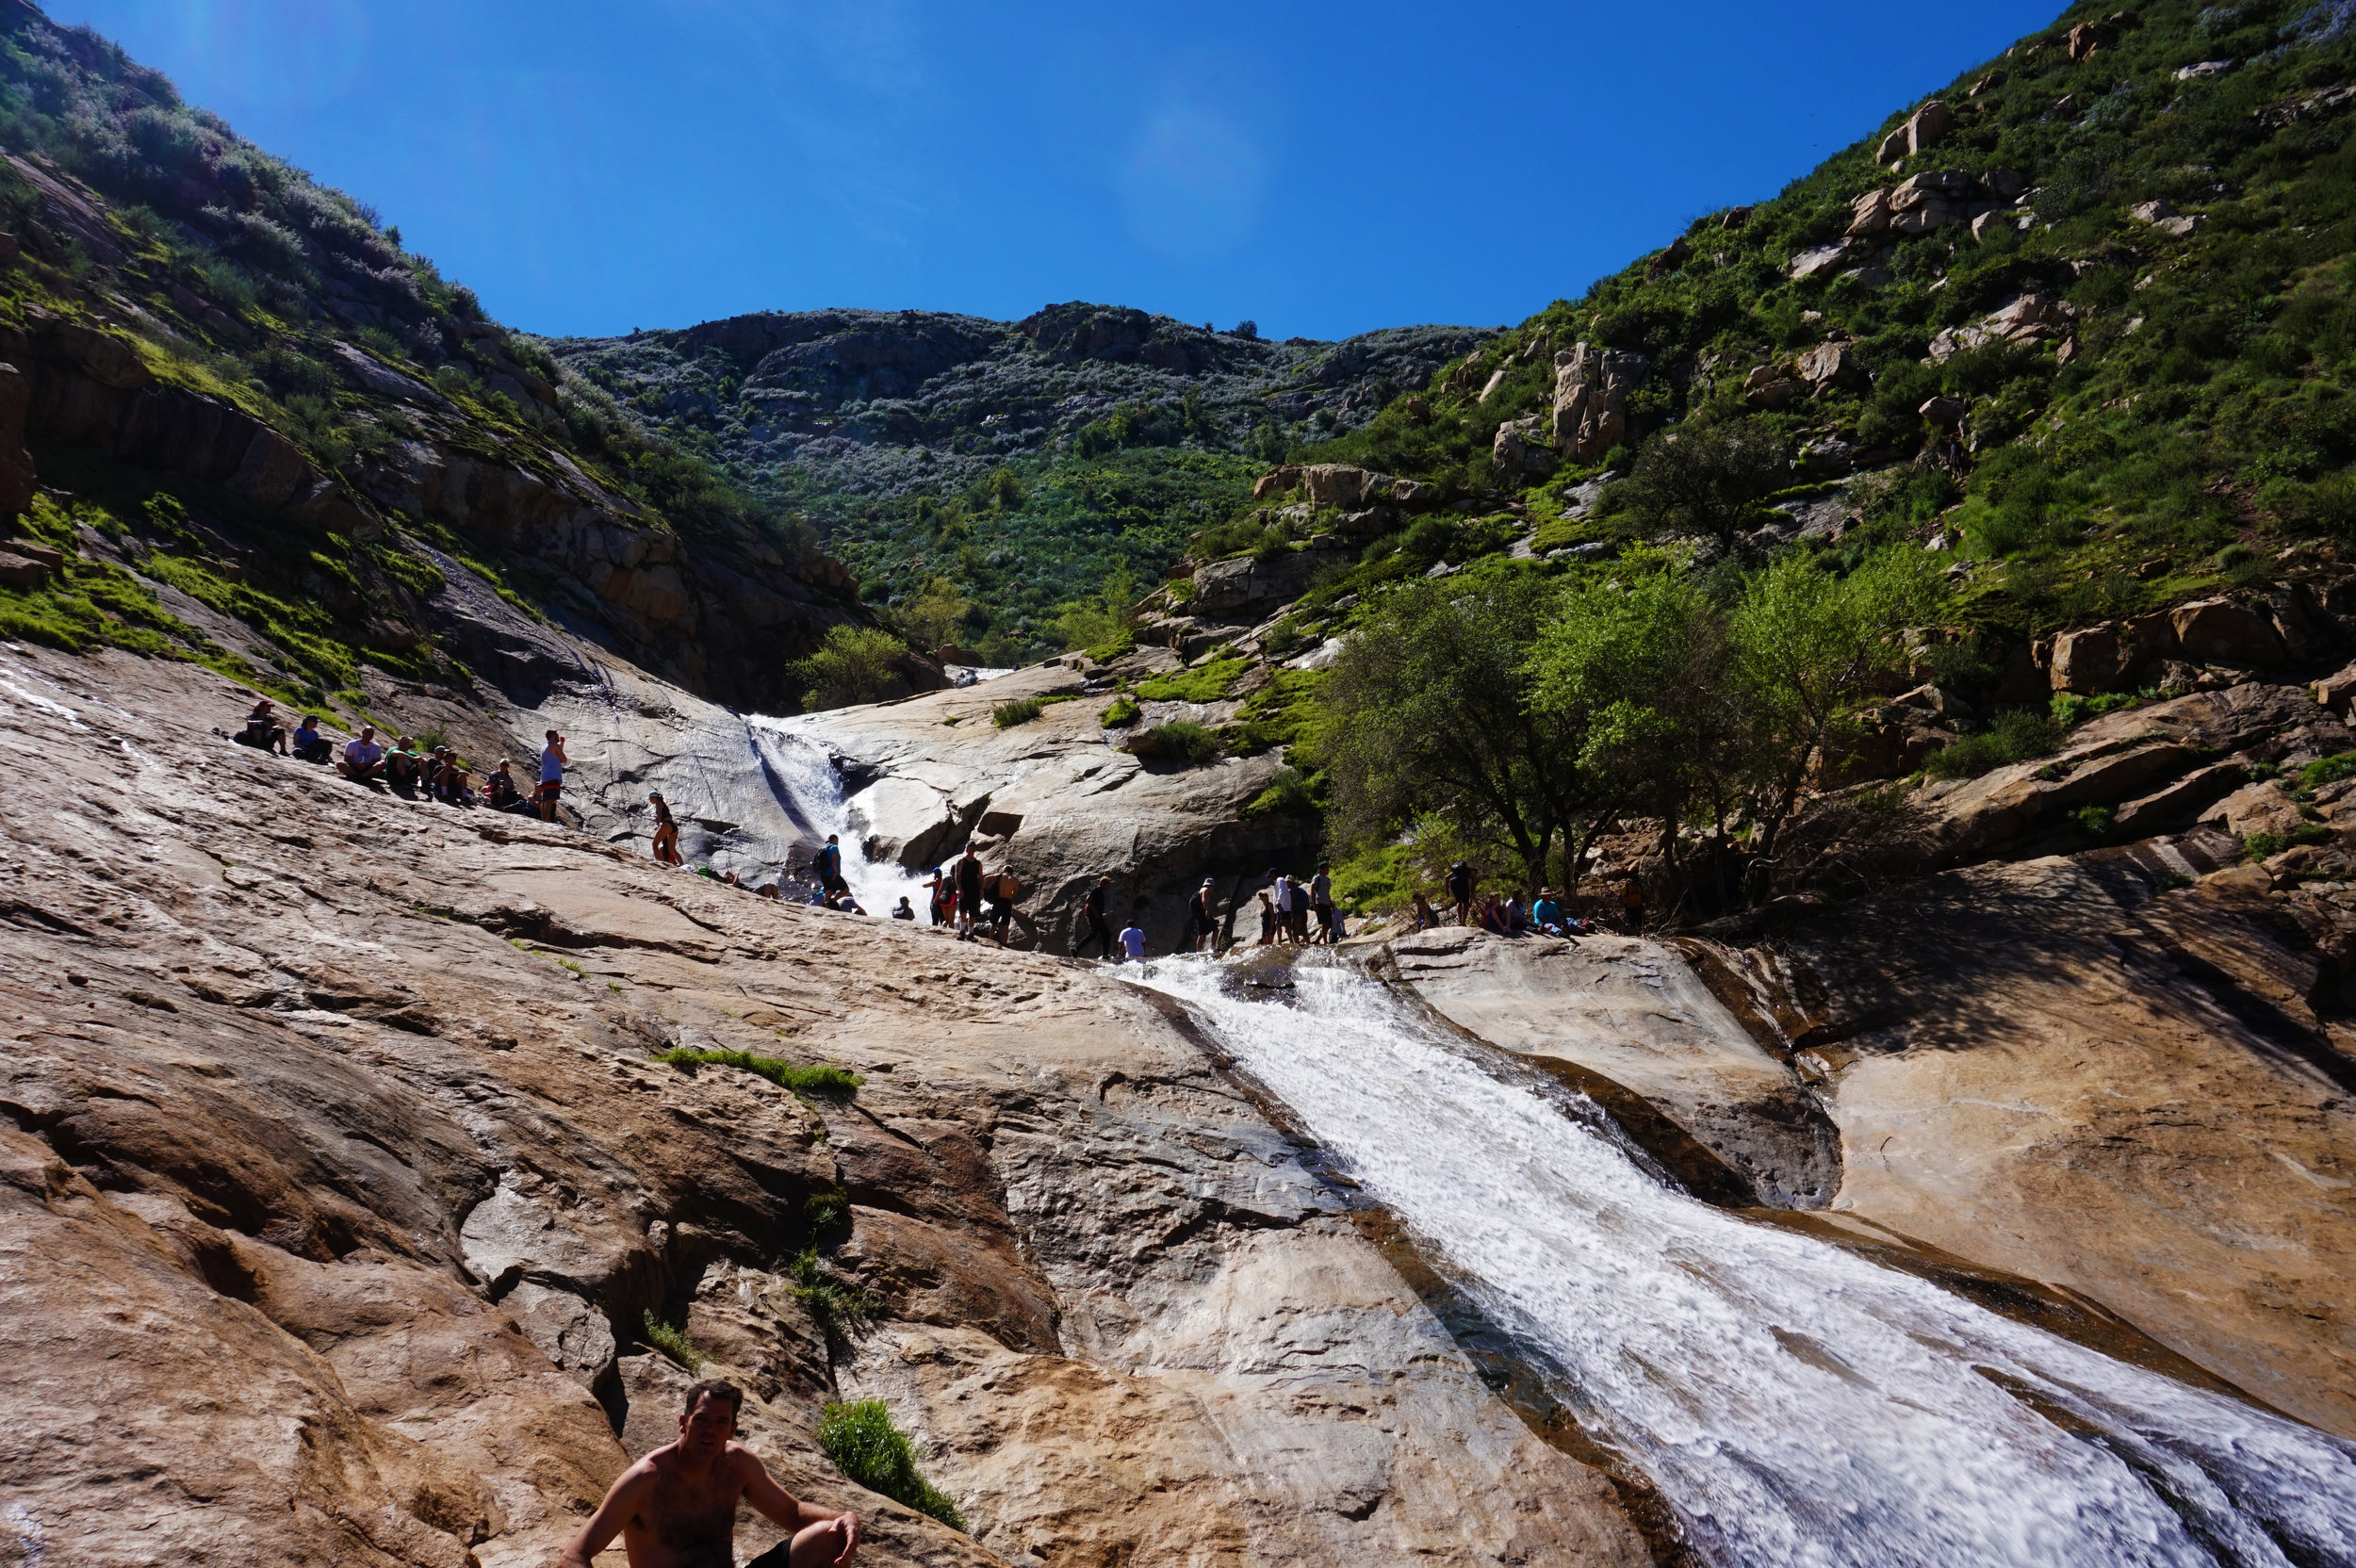 A beautiful San Diego waterfall ft. some random sunbather